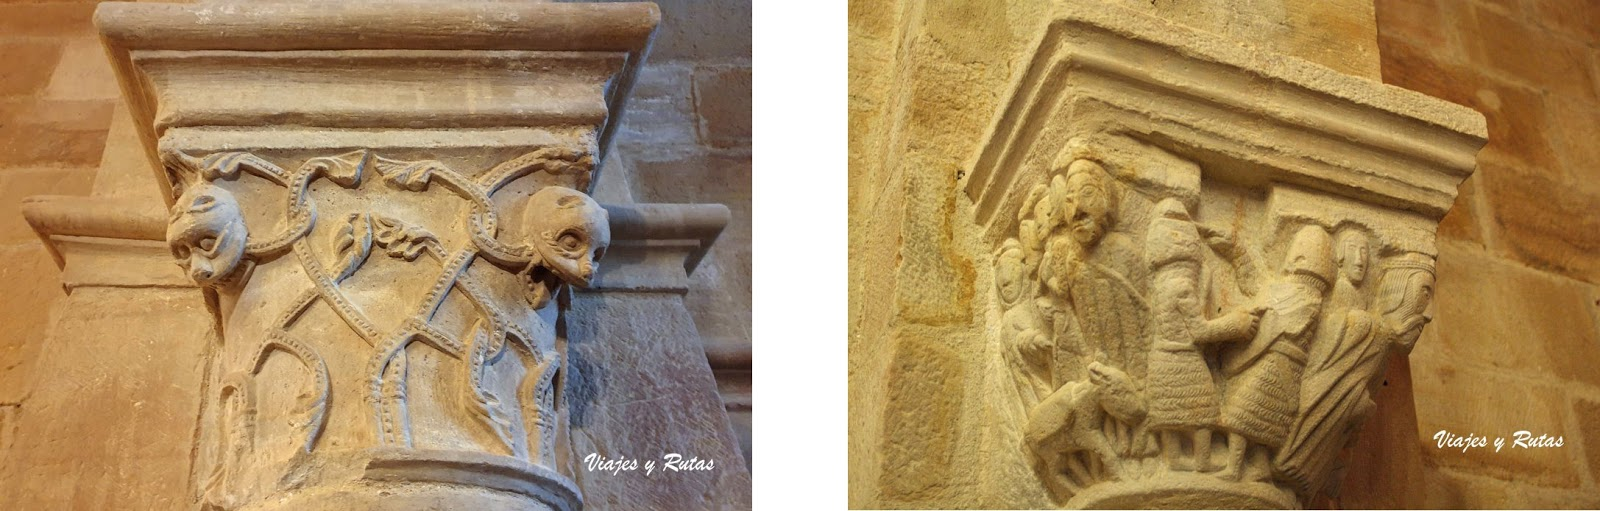 Capiteles de Santa Cecilia, Aguilar de Campóo